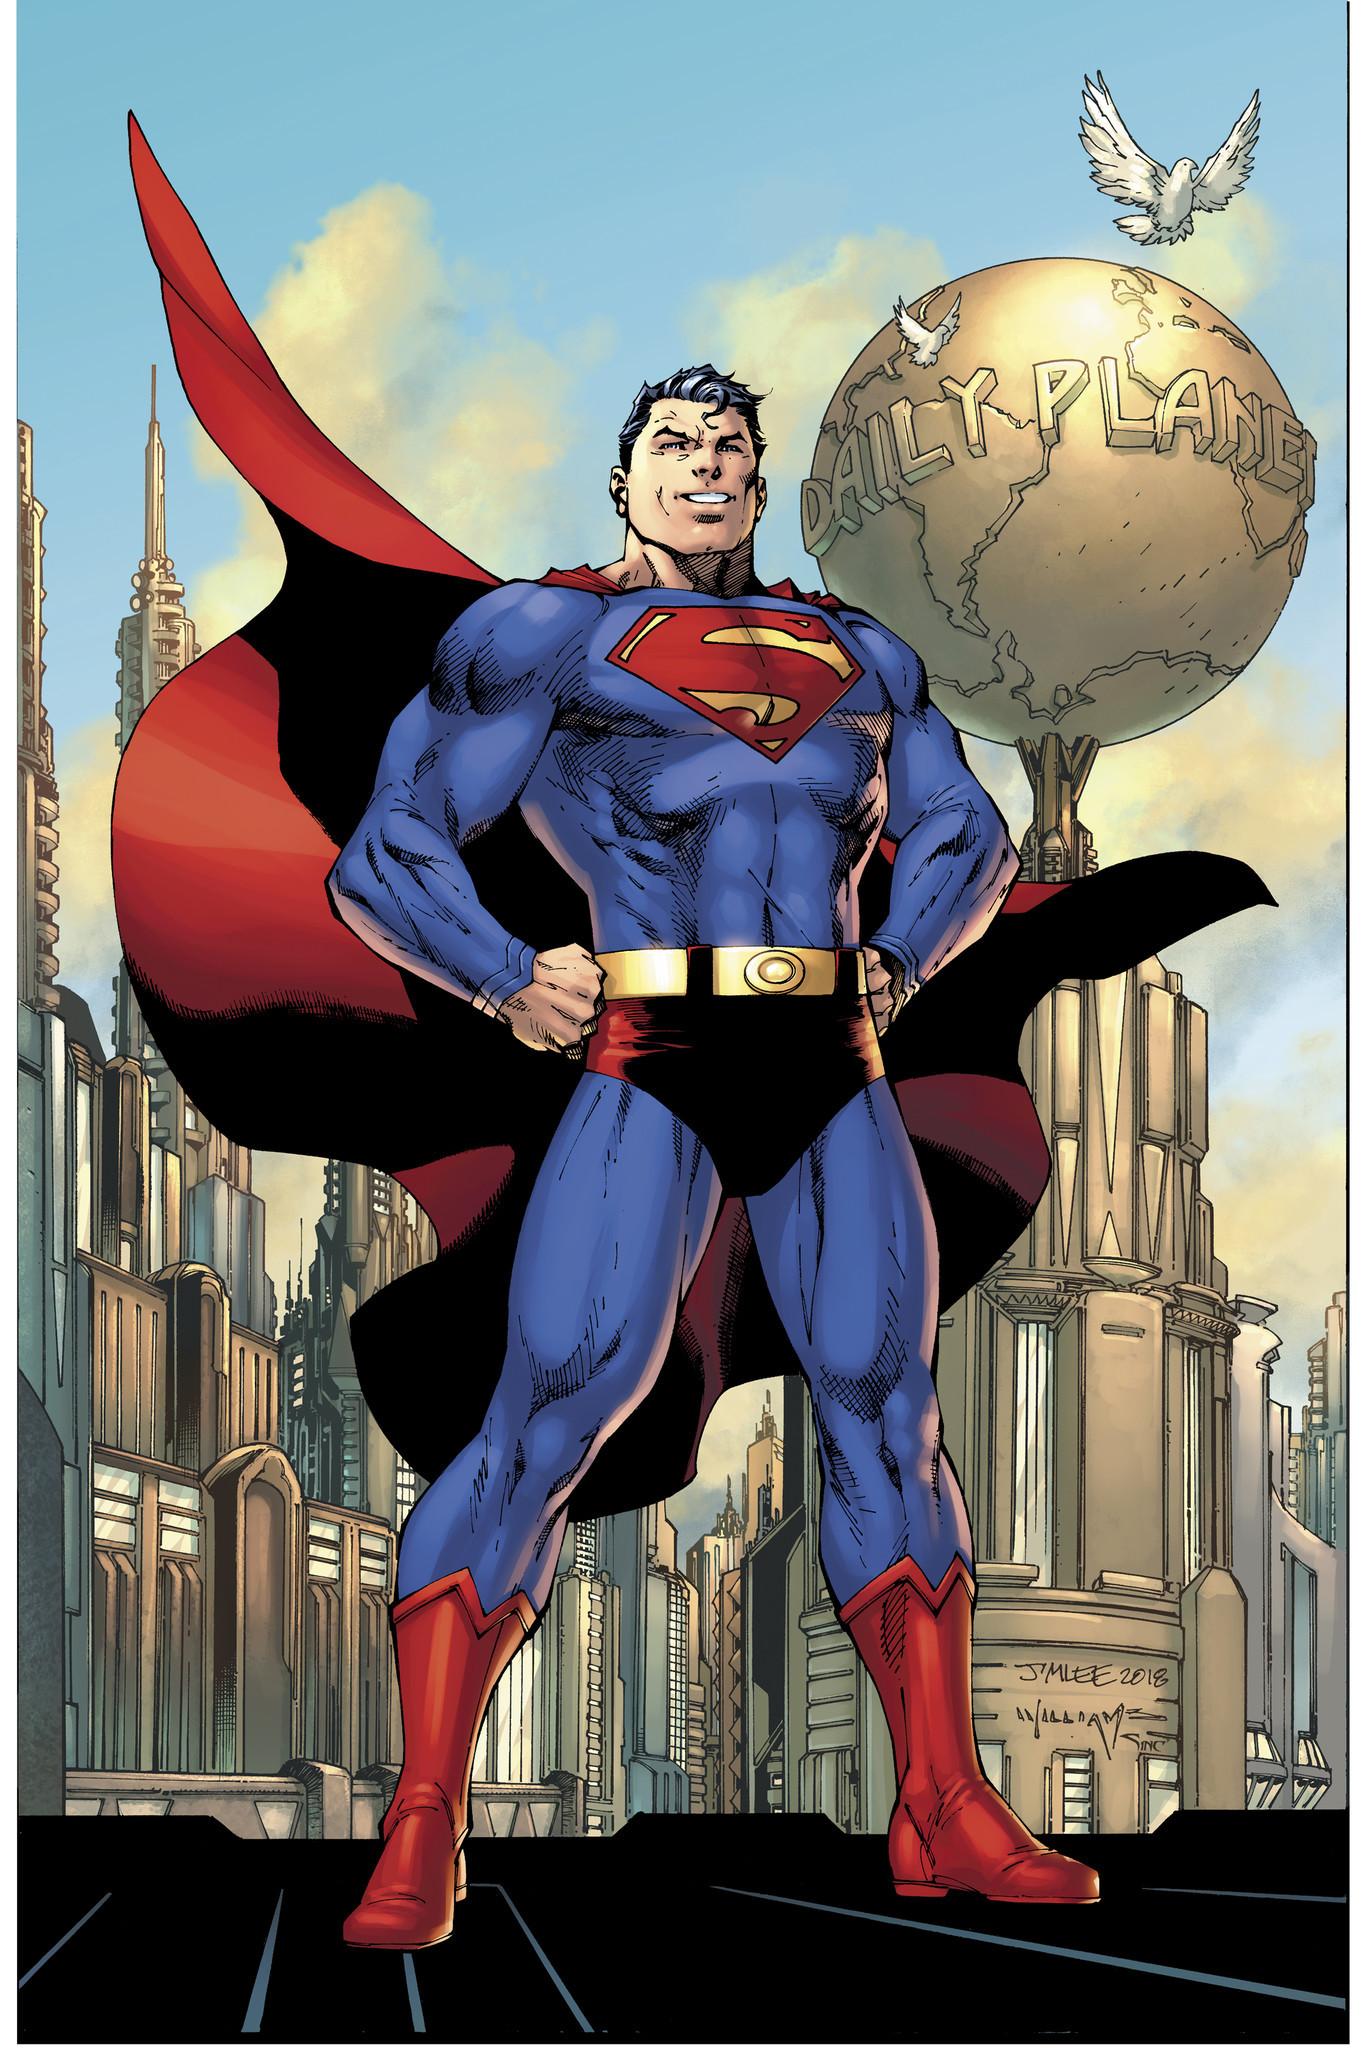 Jim Lee's rendition of Superman